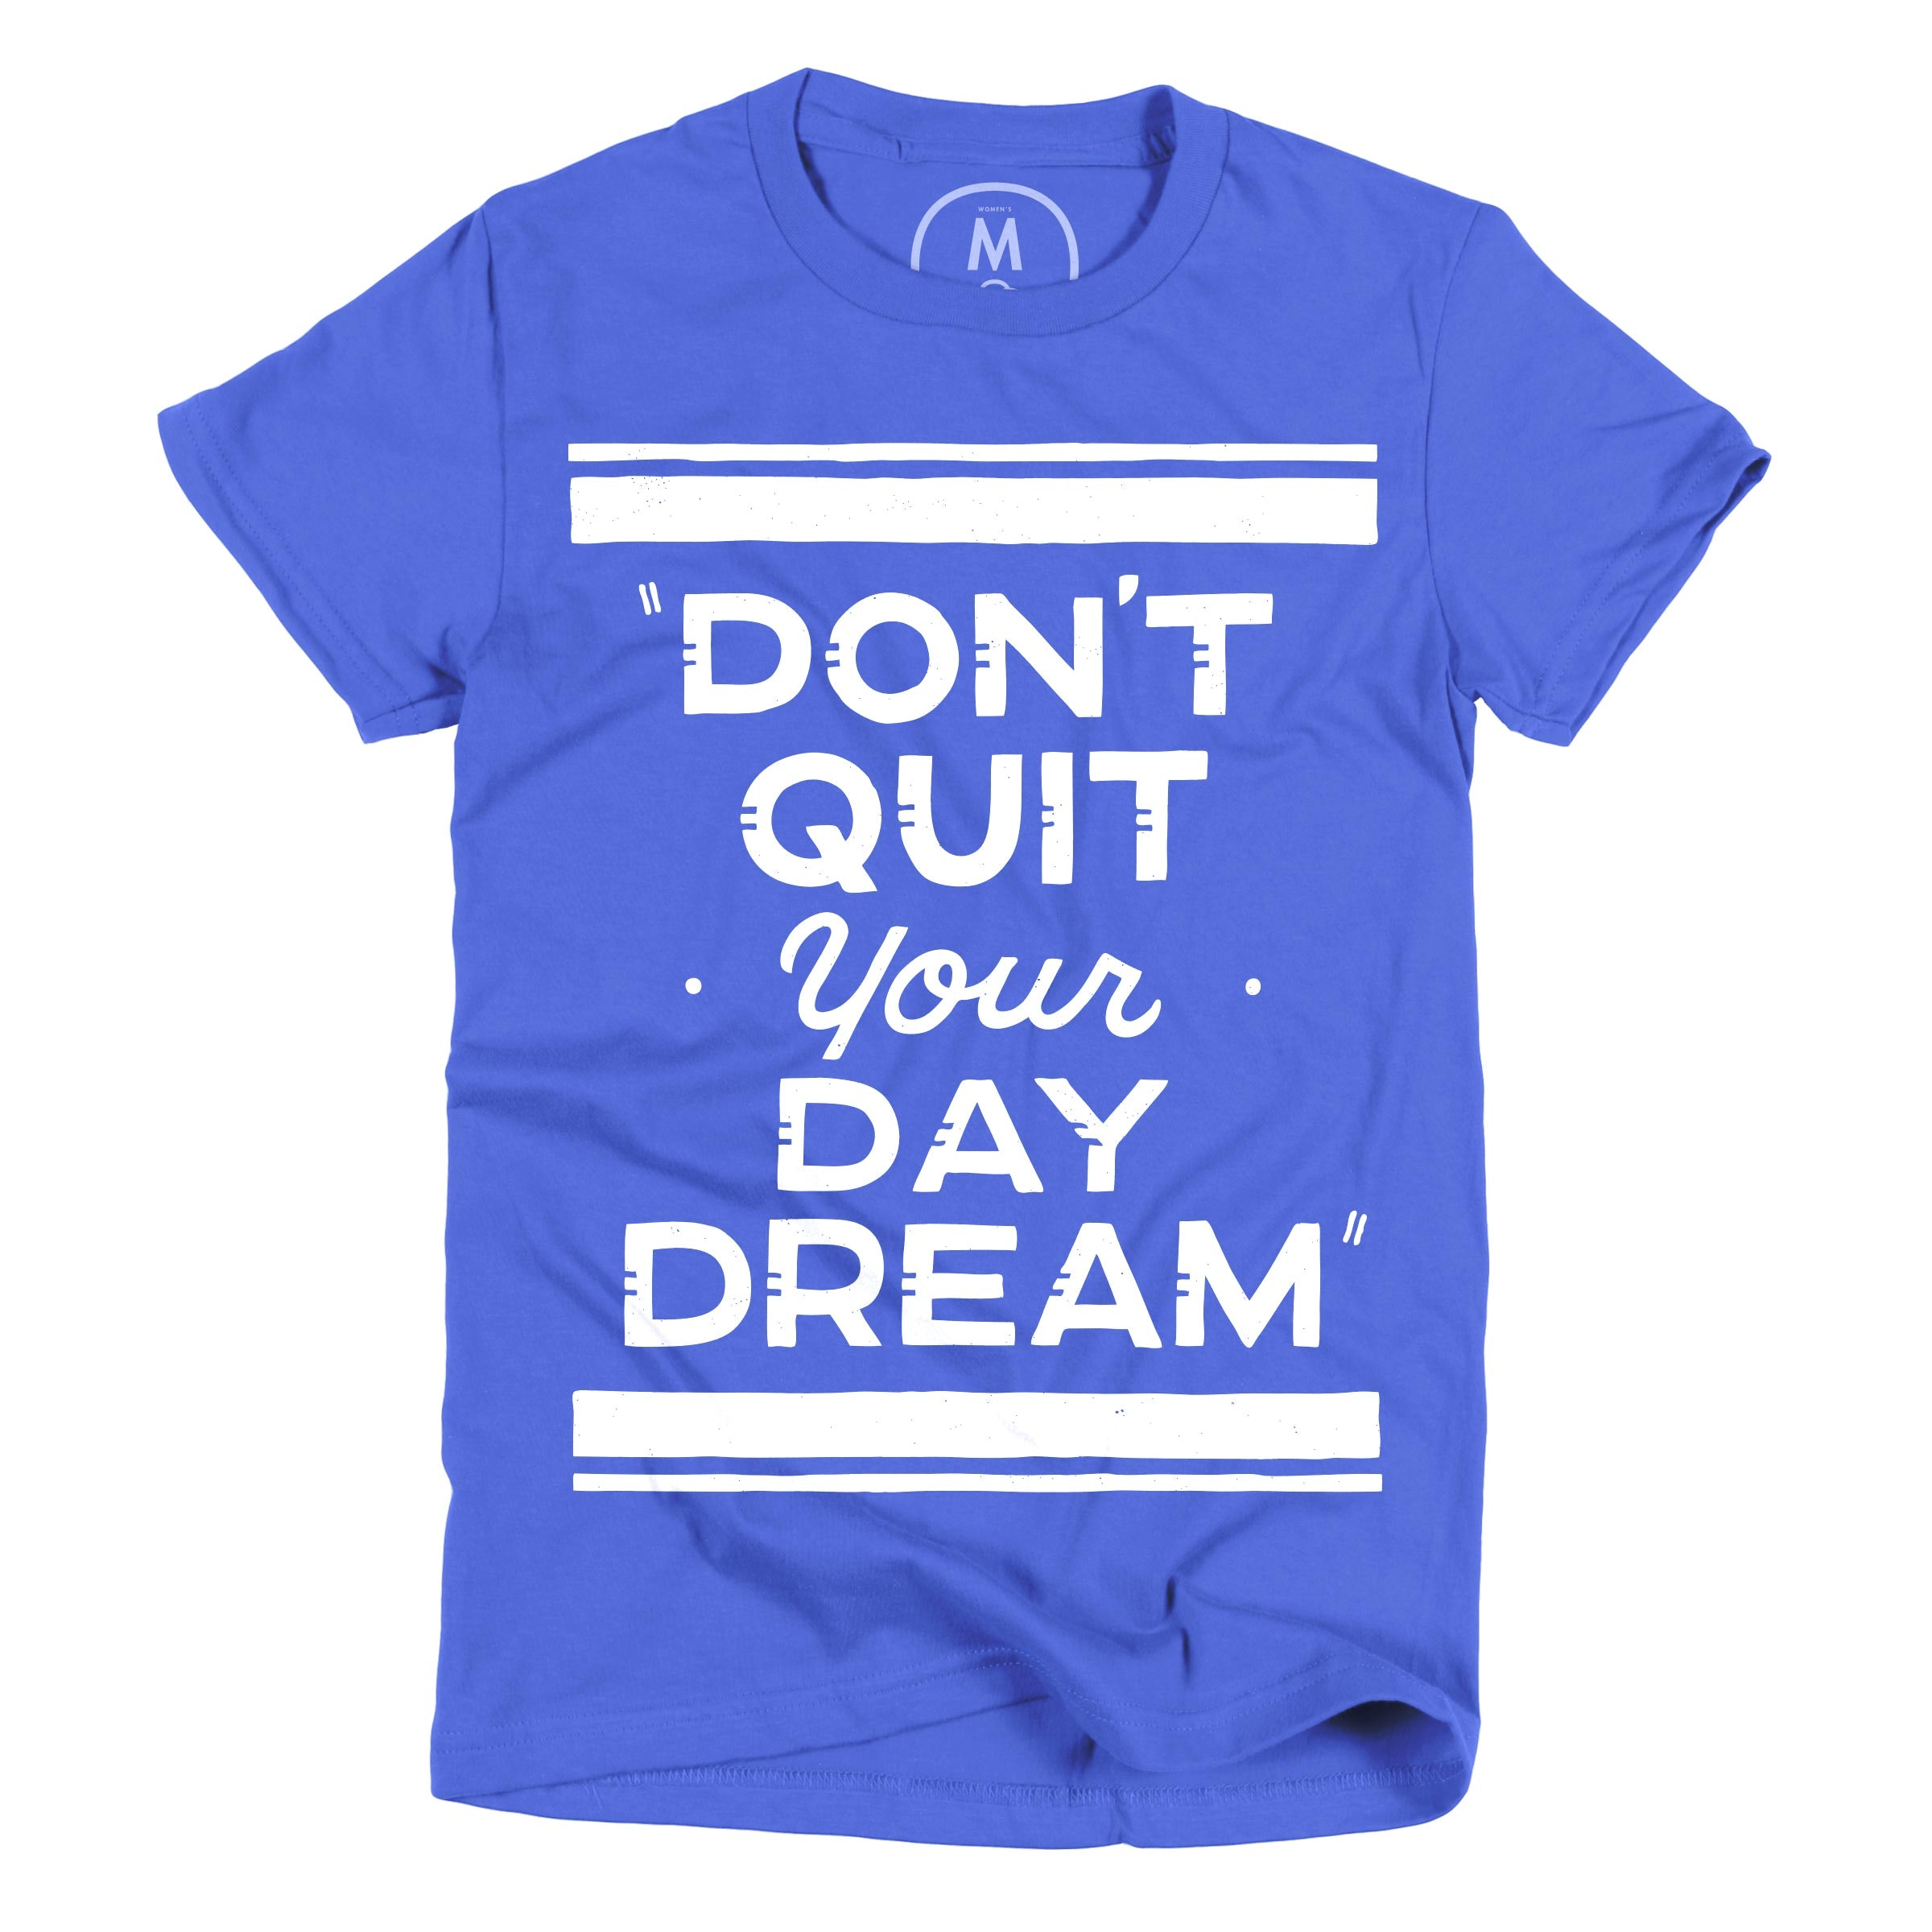 Daydream Hers